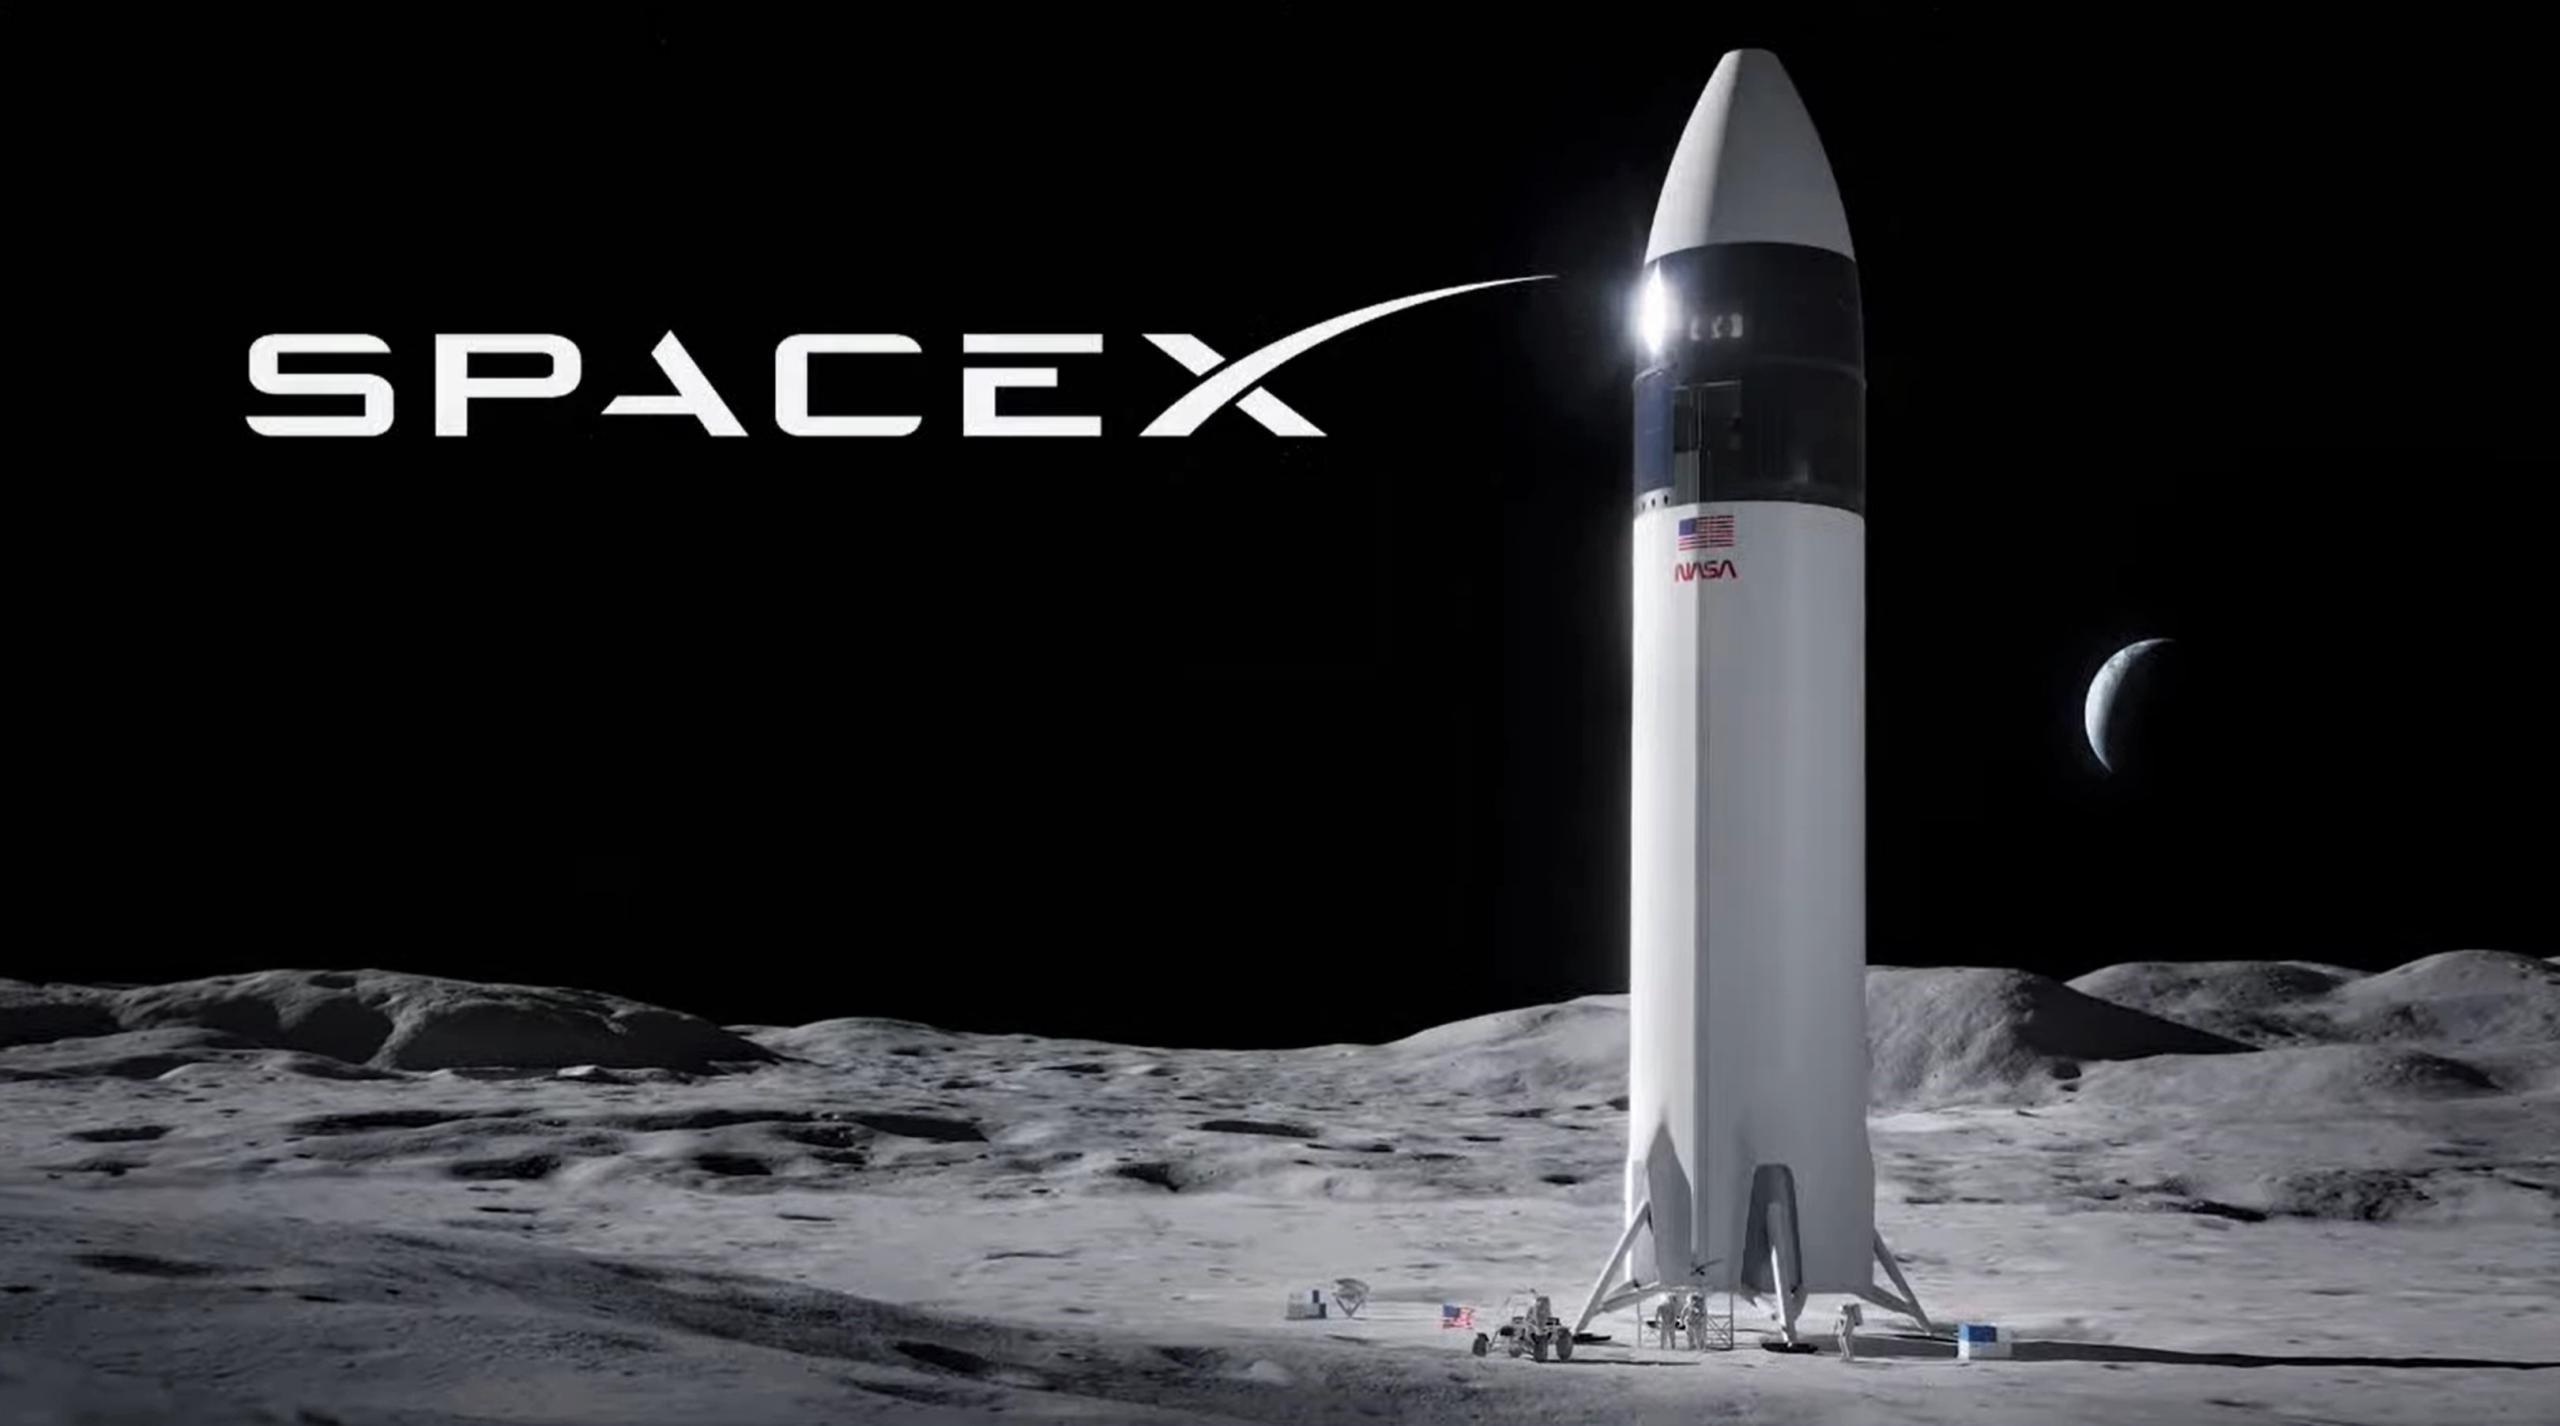 Lunar Starship Artemis (SpaceX) 2021 render 1 (c)